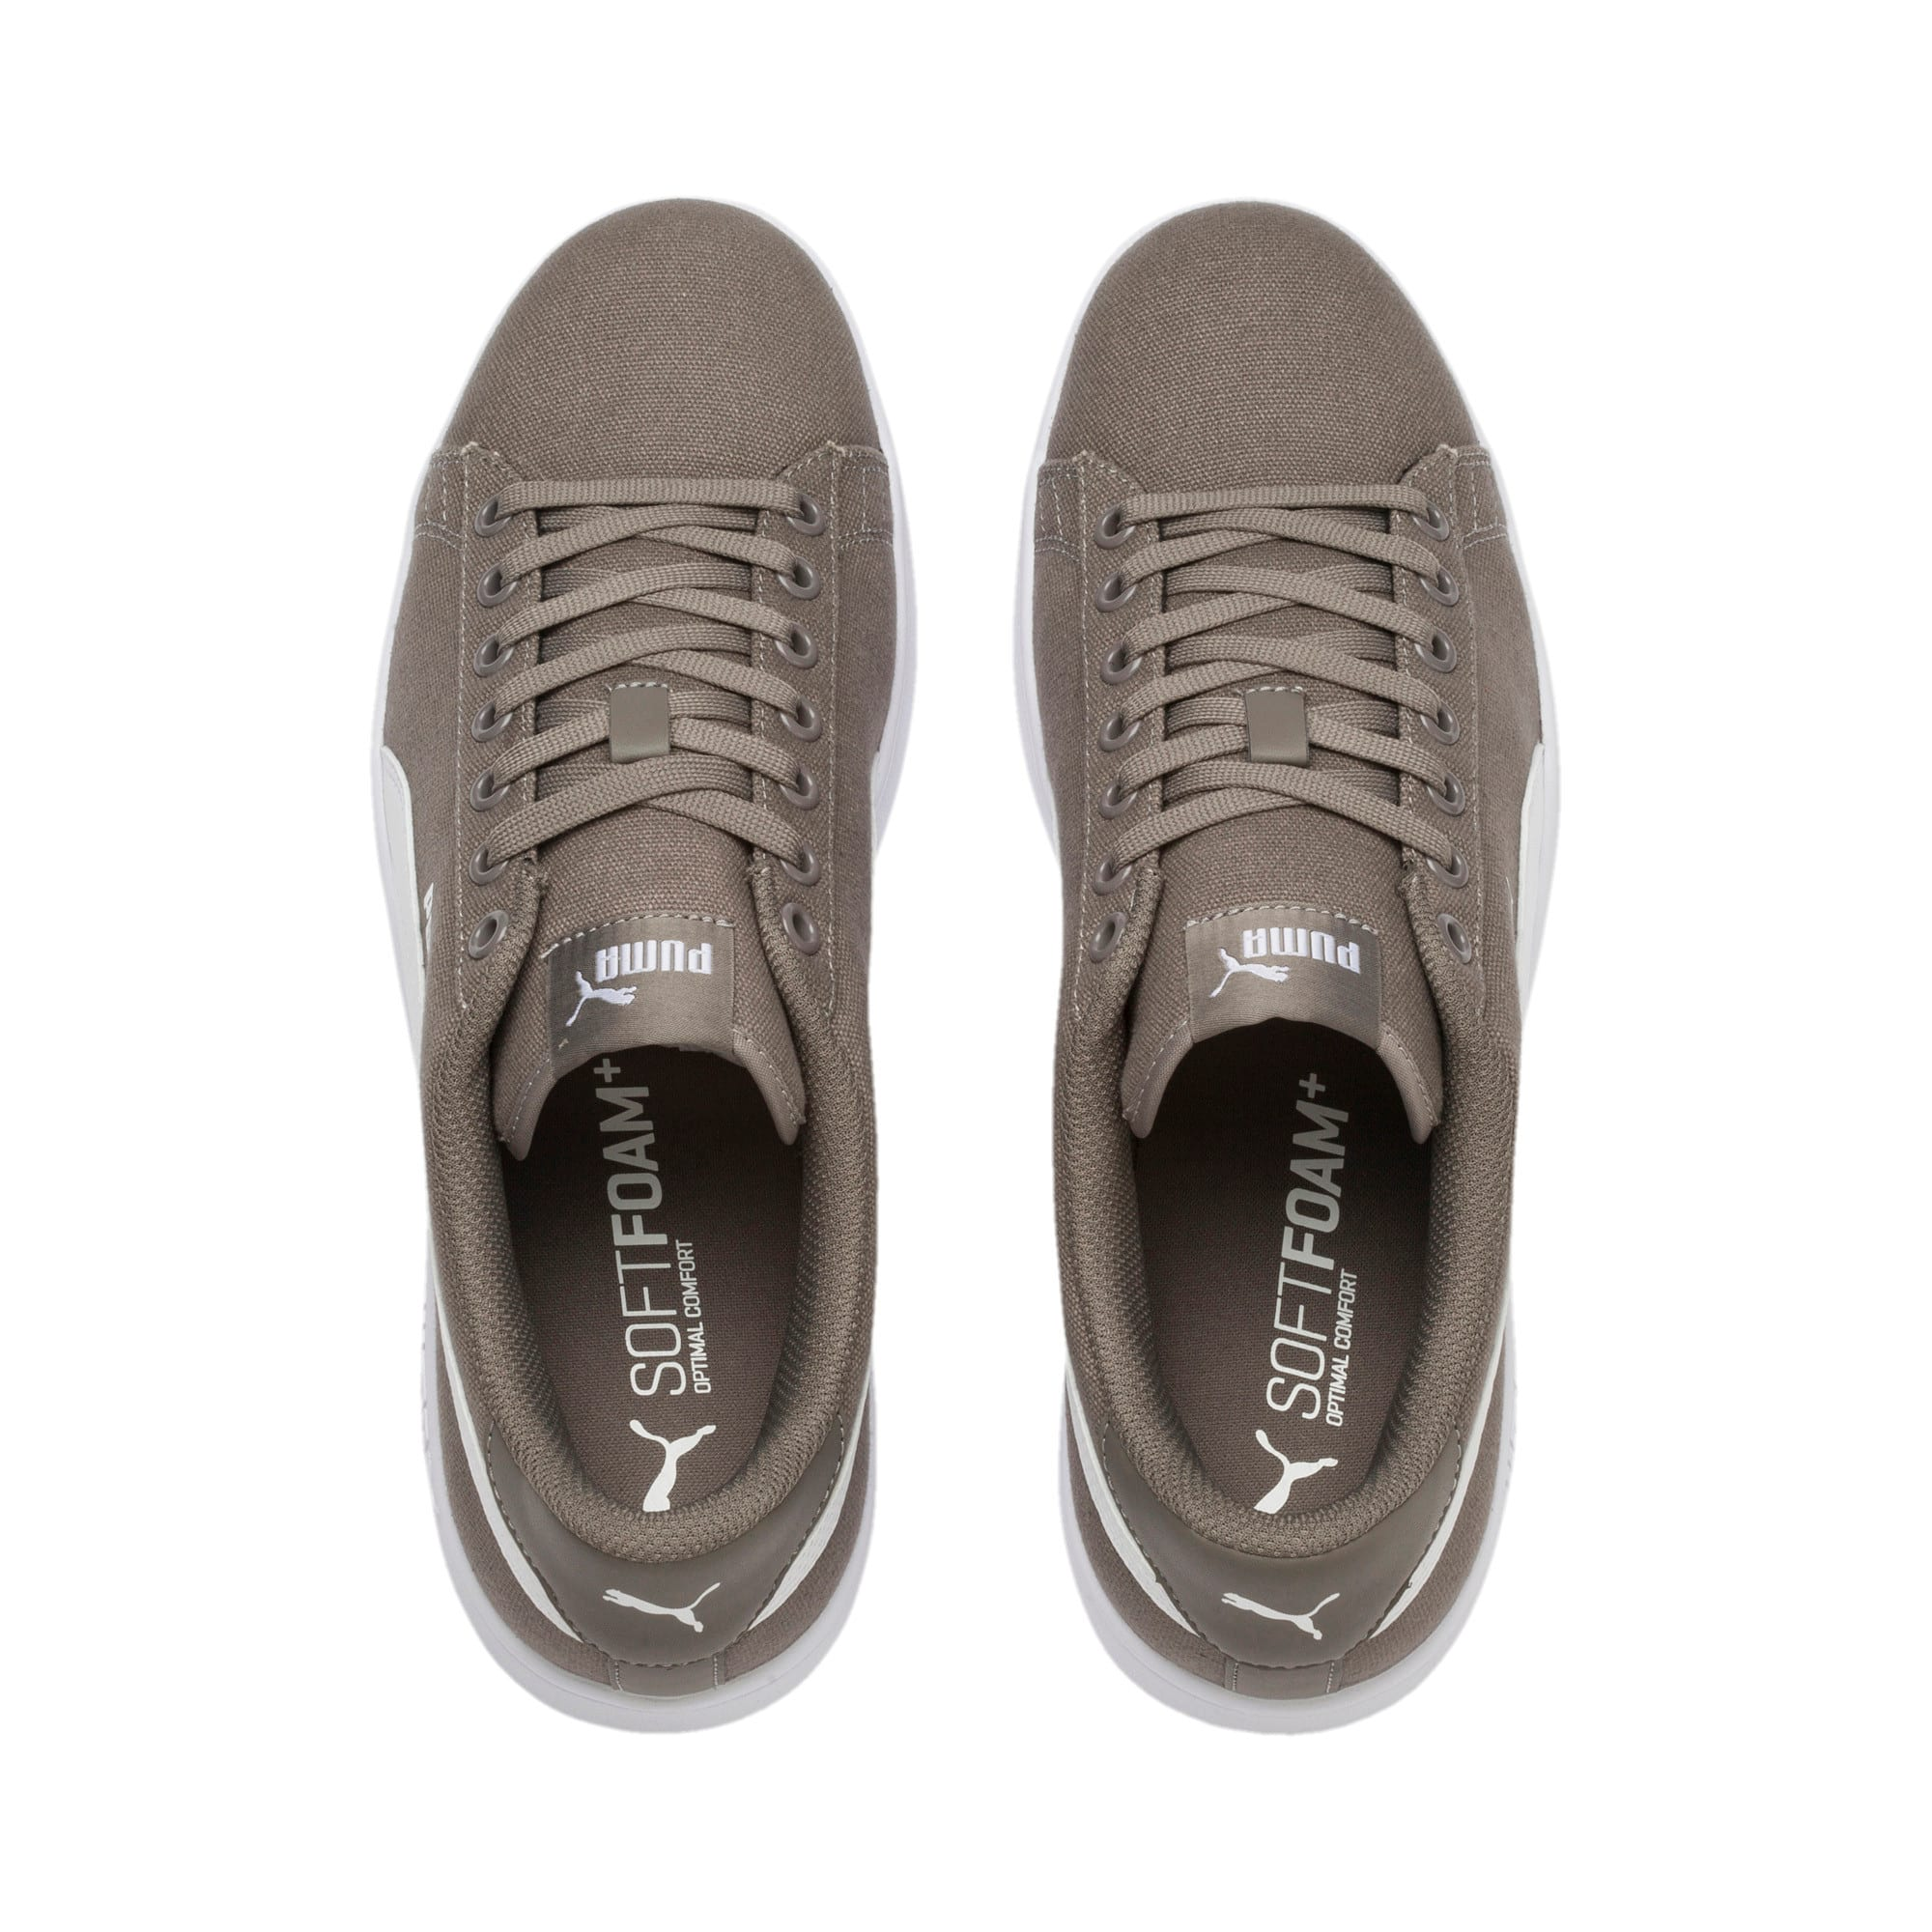 Thumbnail 6 of PUMA Smash v2 Sneakers, Charcoal Gray-Puma White, medium-IND